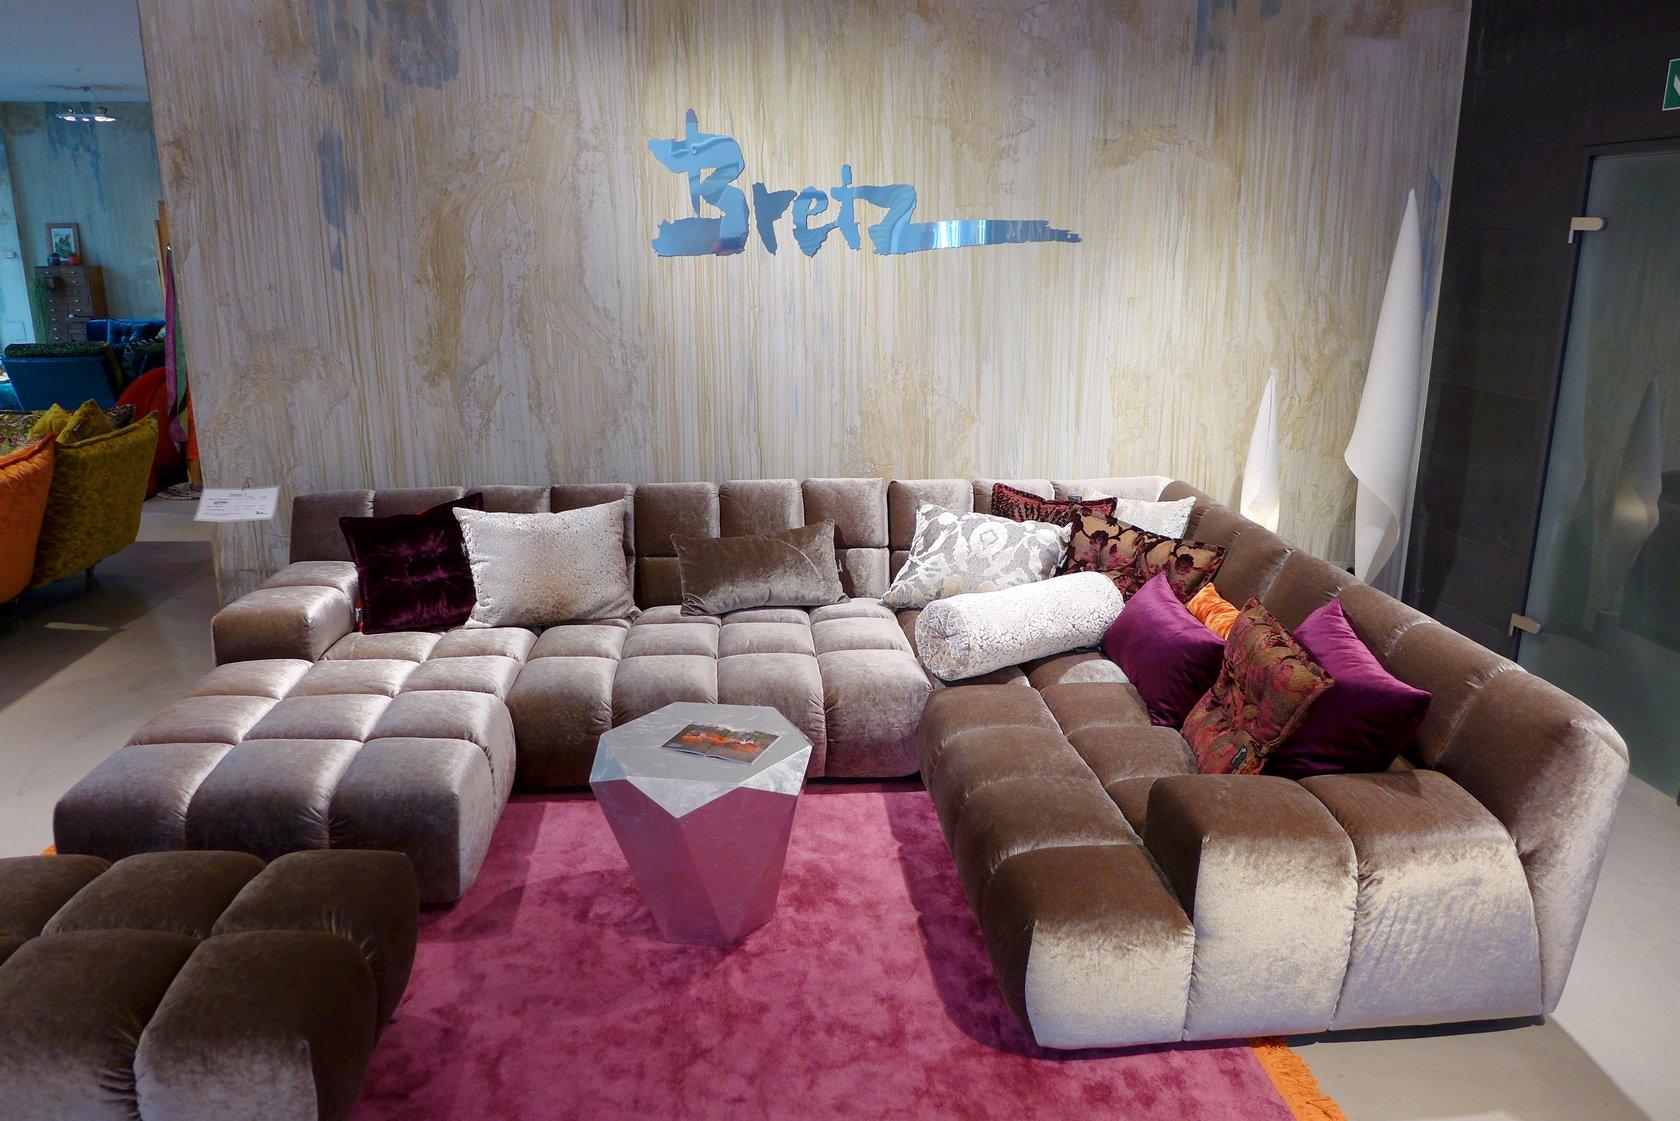 bretz flagship store koeln 2017 10 23 012 bretz store k ln. Black Bedroom Furniture Sets. Home Design Ideas